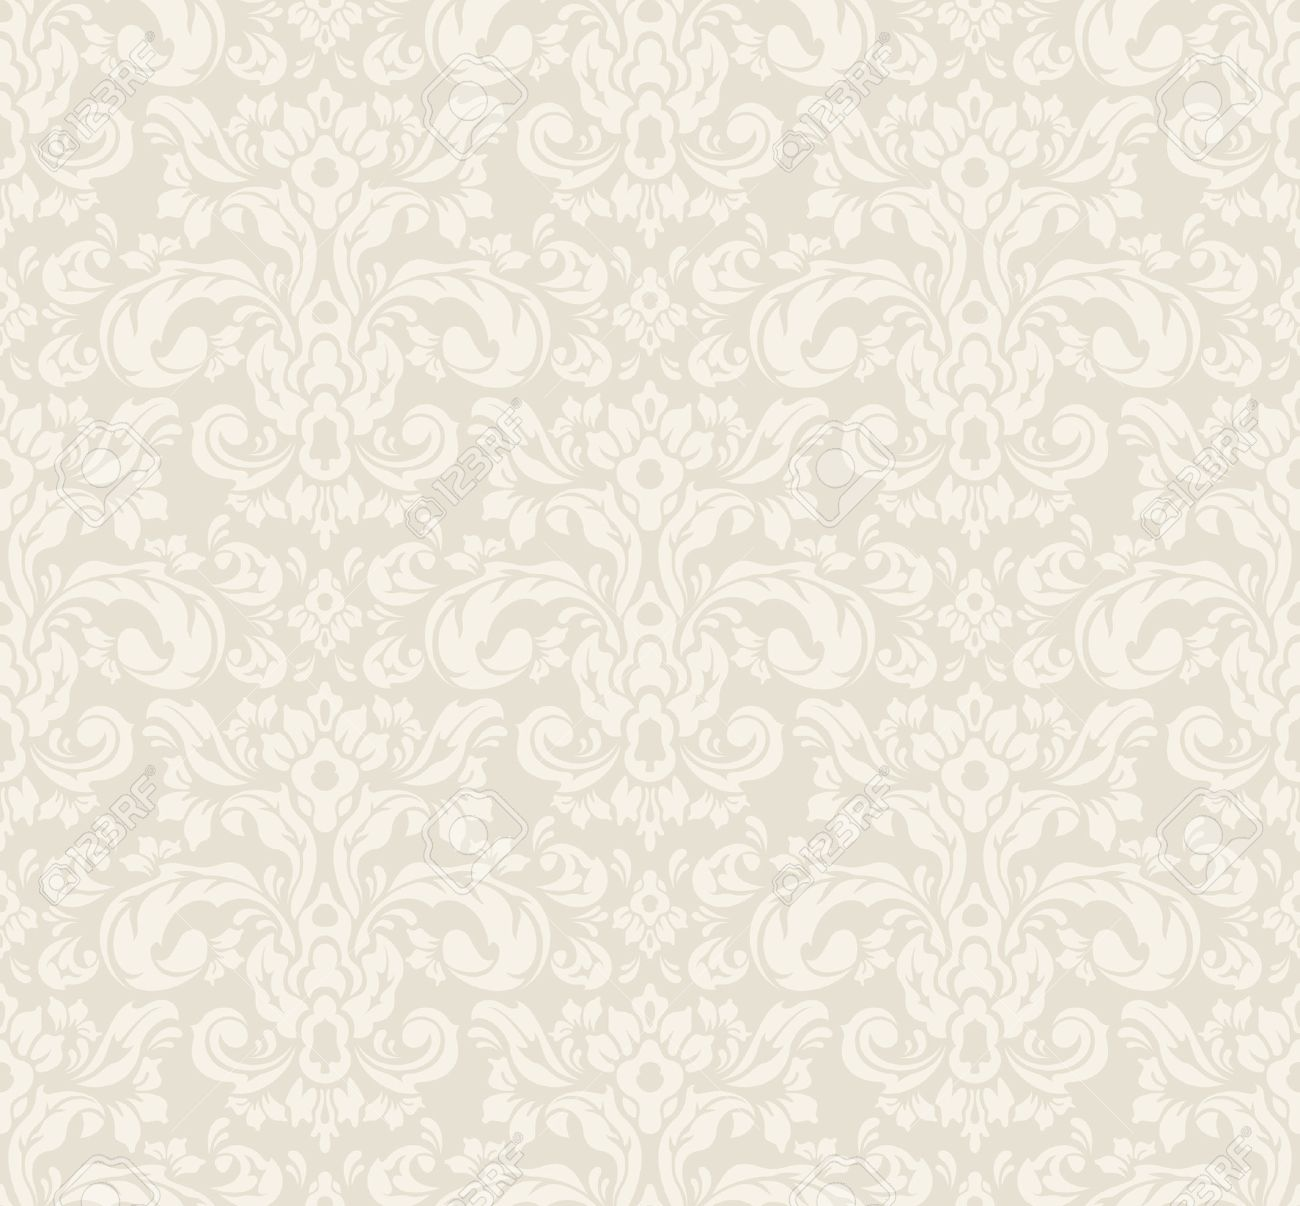 Beige Seamless Vintage Floral Wallpaper Pattern Vector Format